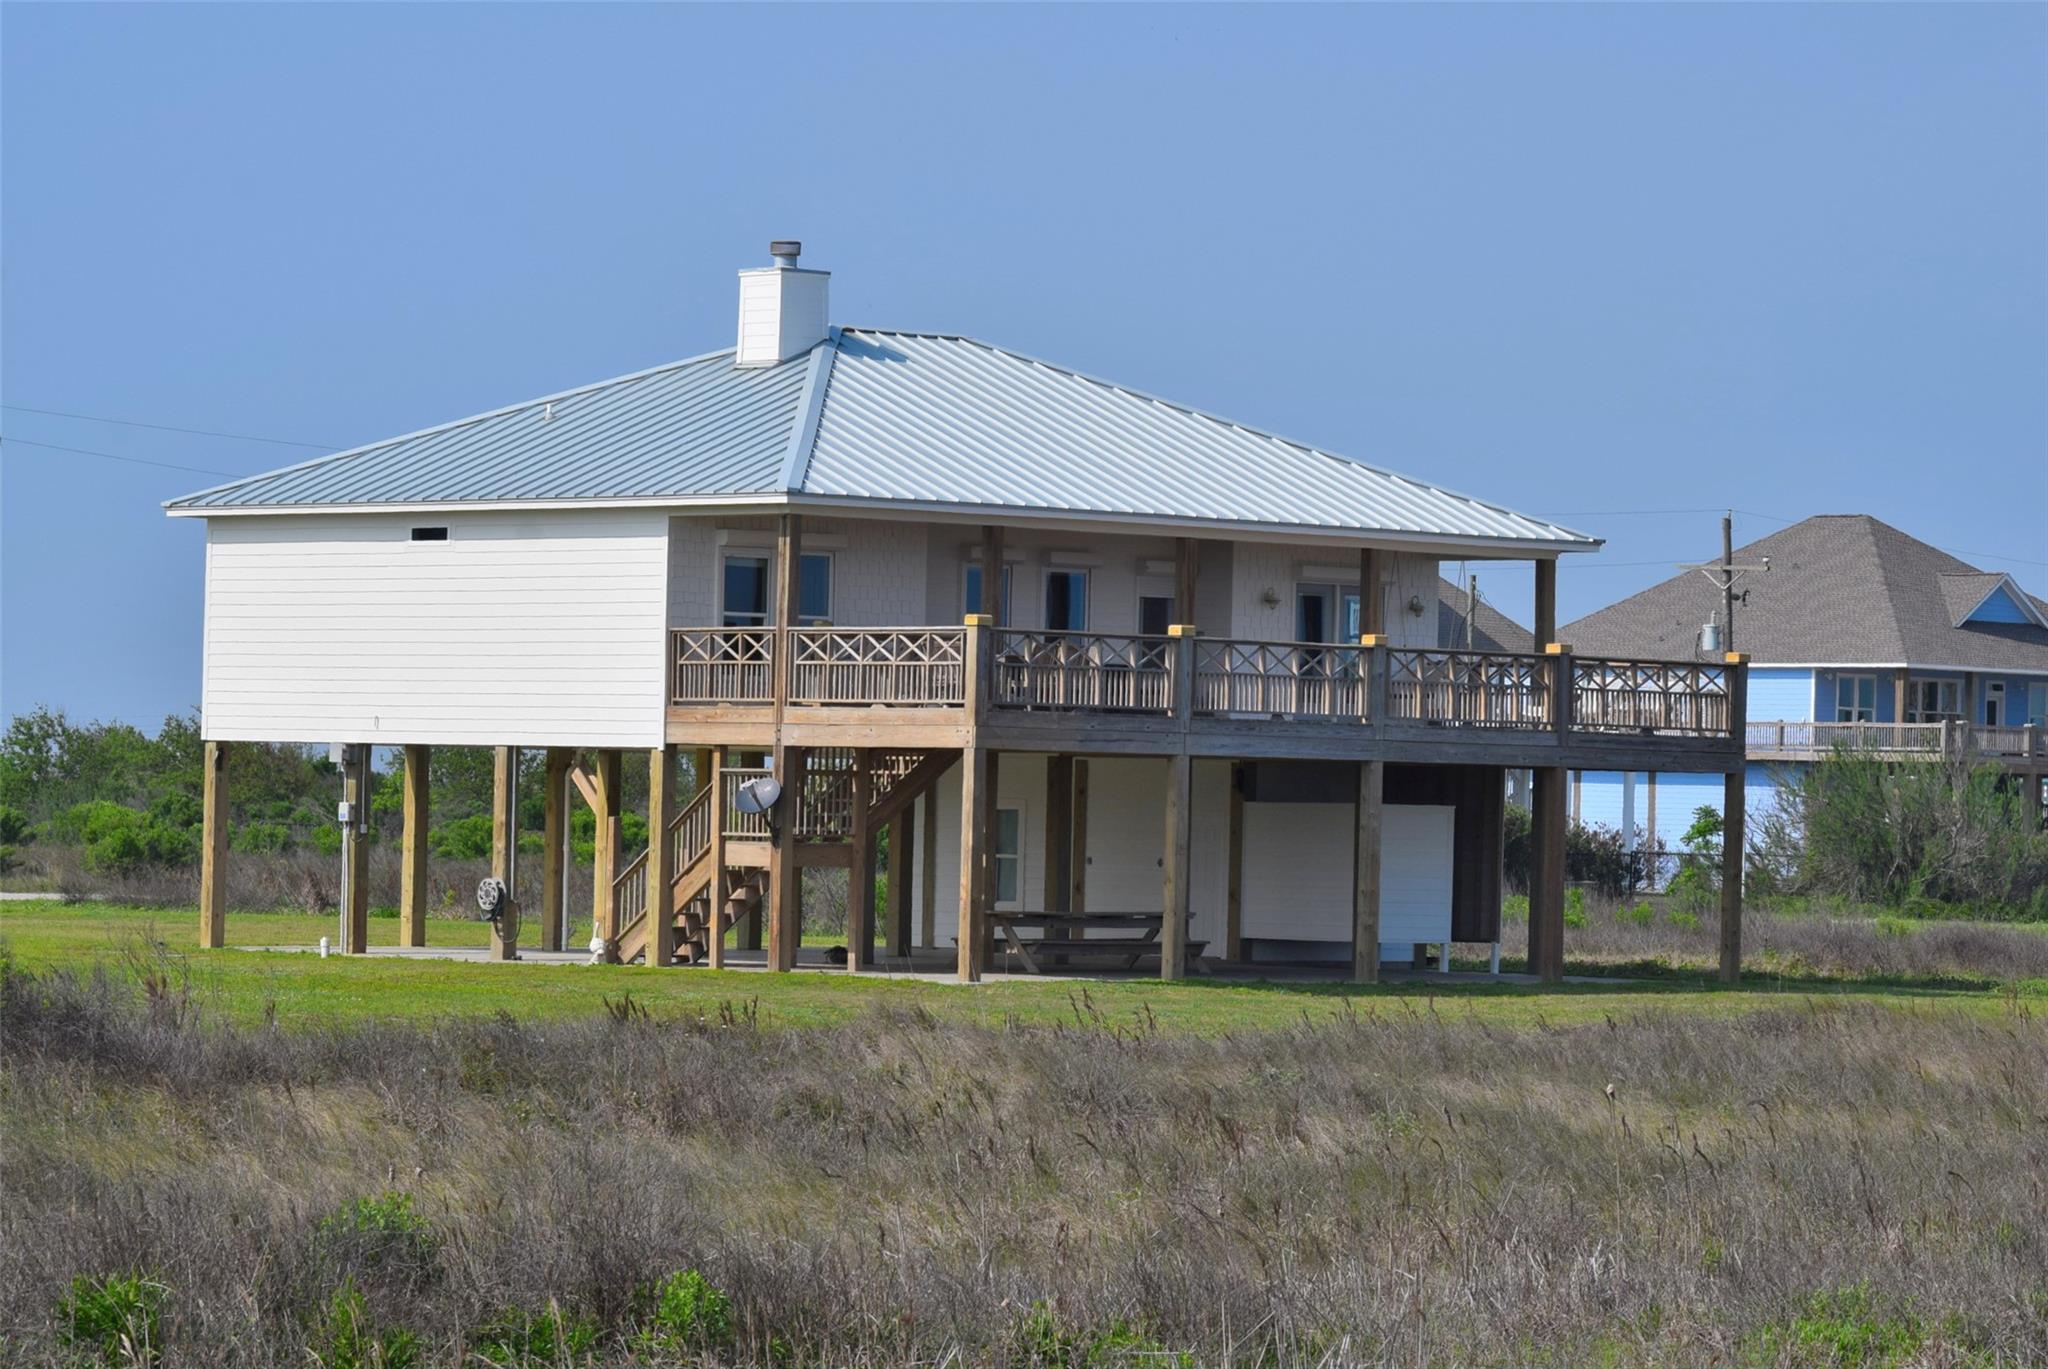 362 Atkinson Property Photo - Crystal Beach, TX real estate listing